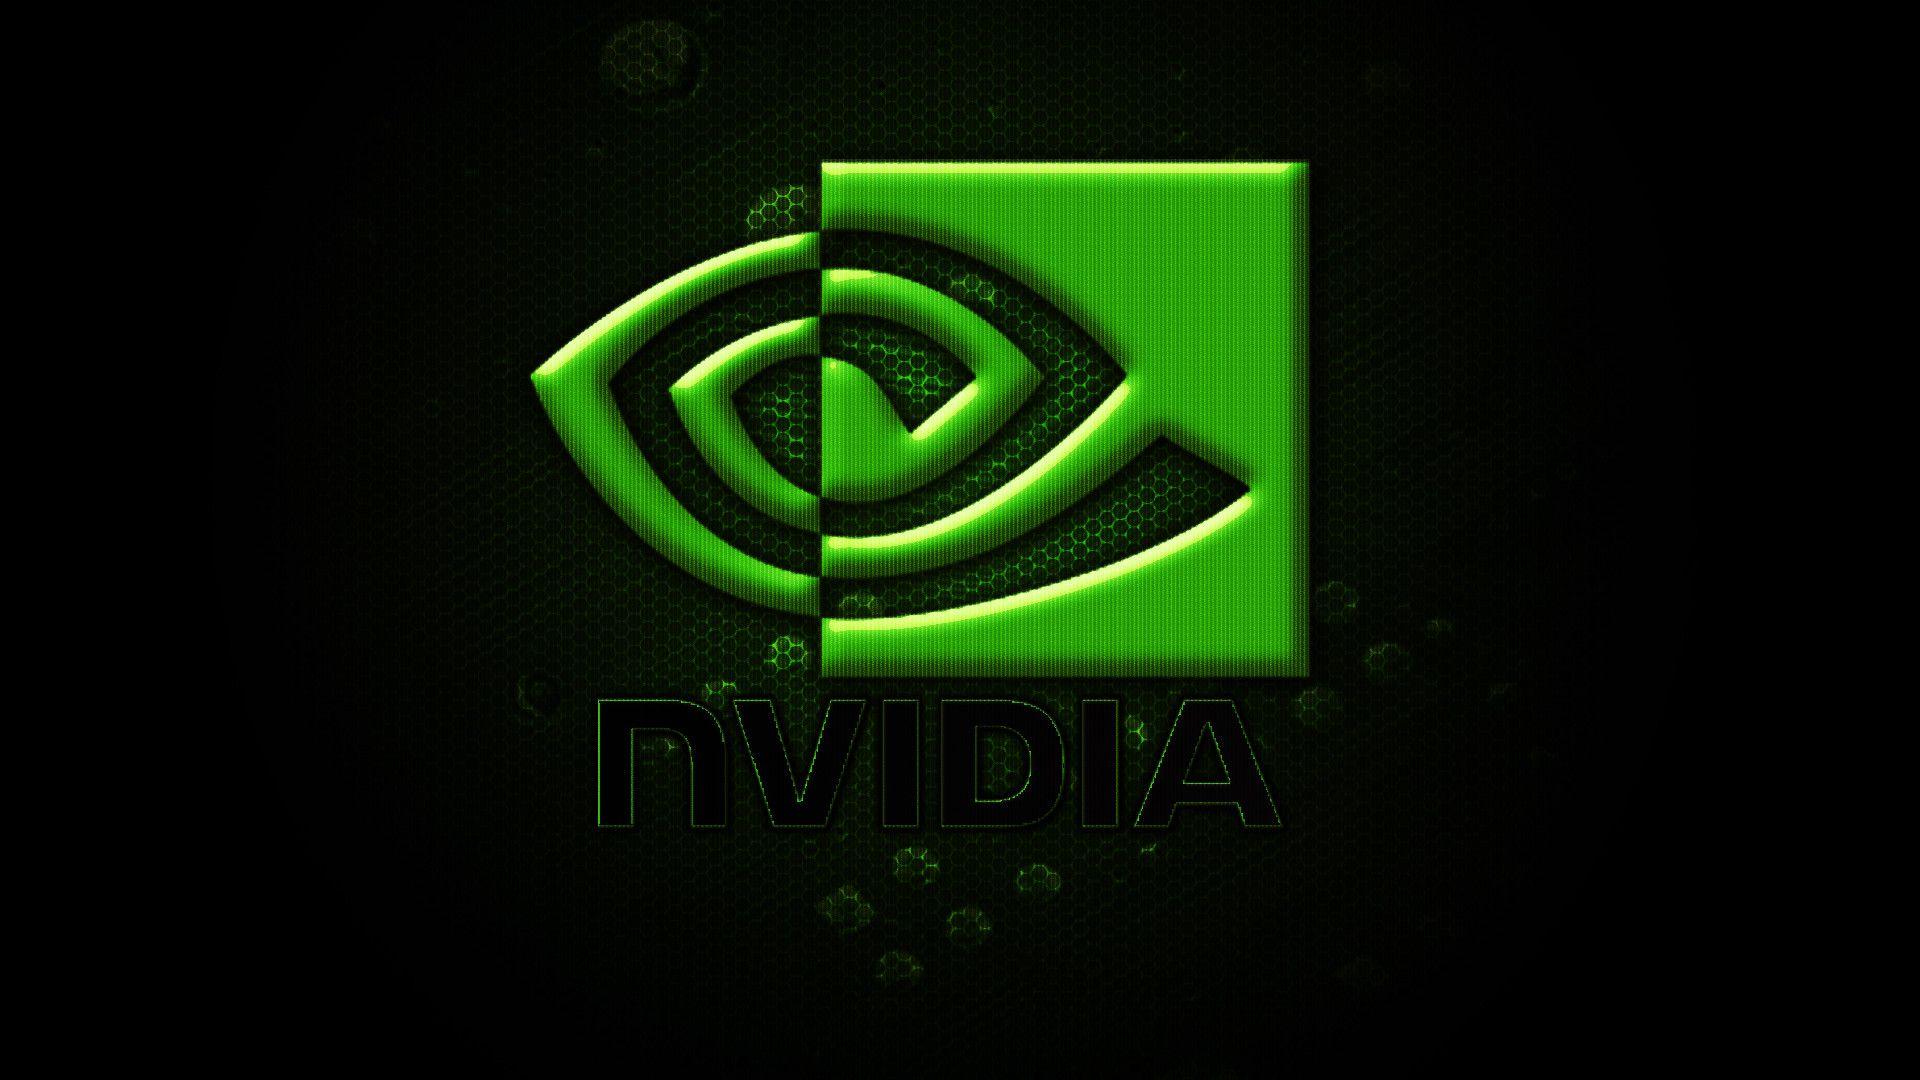 nvidia - photo #6